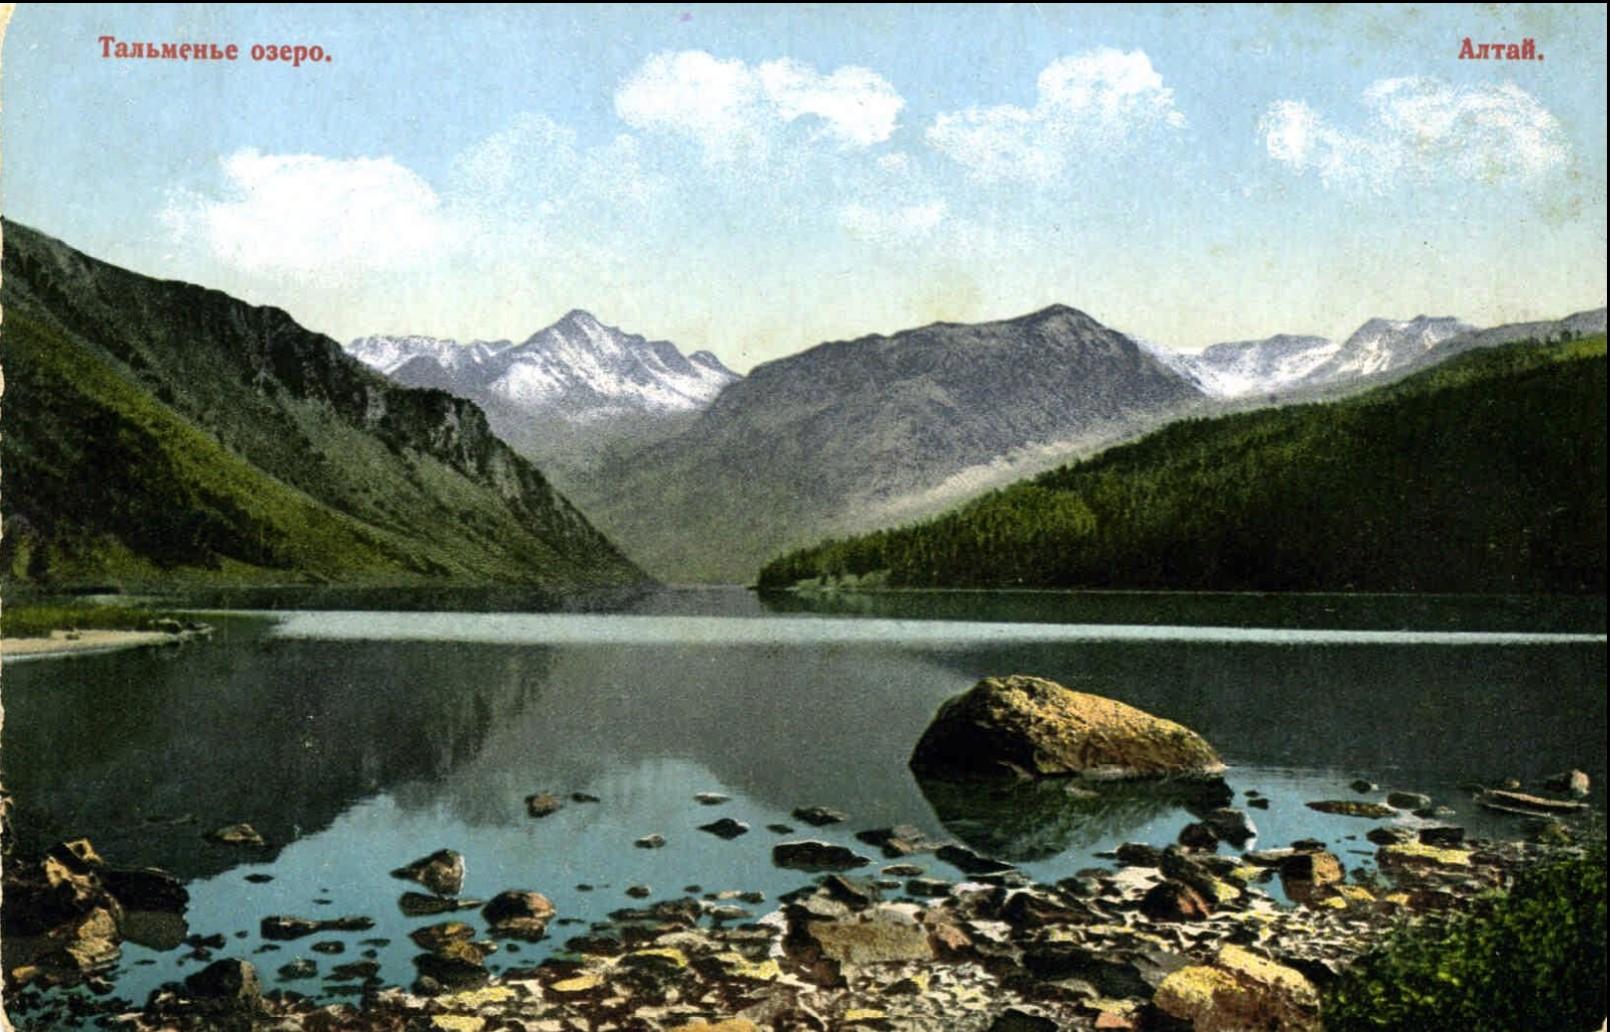 Тальменье озеро